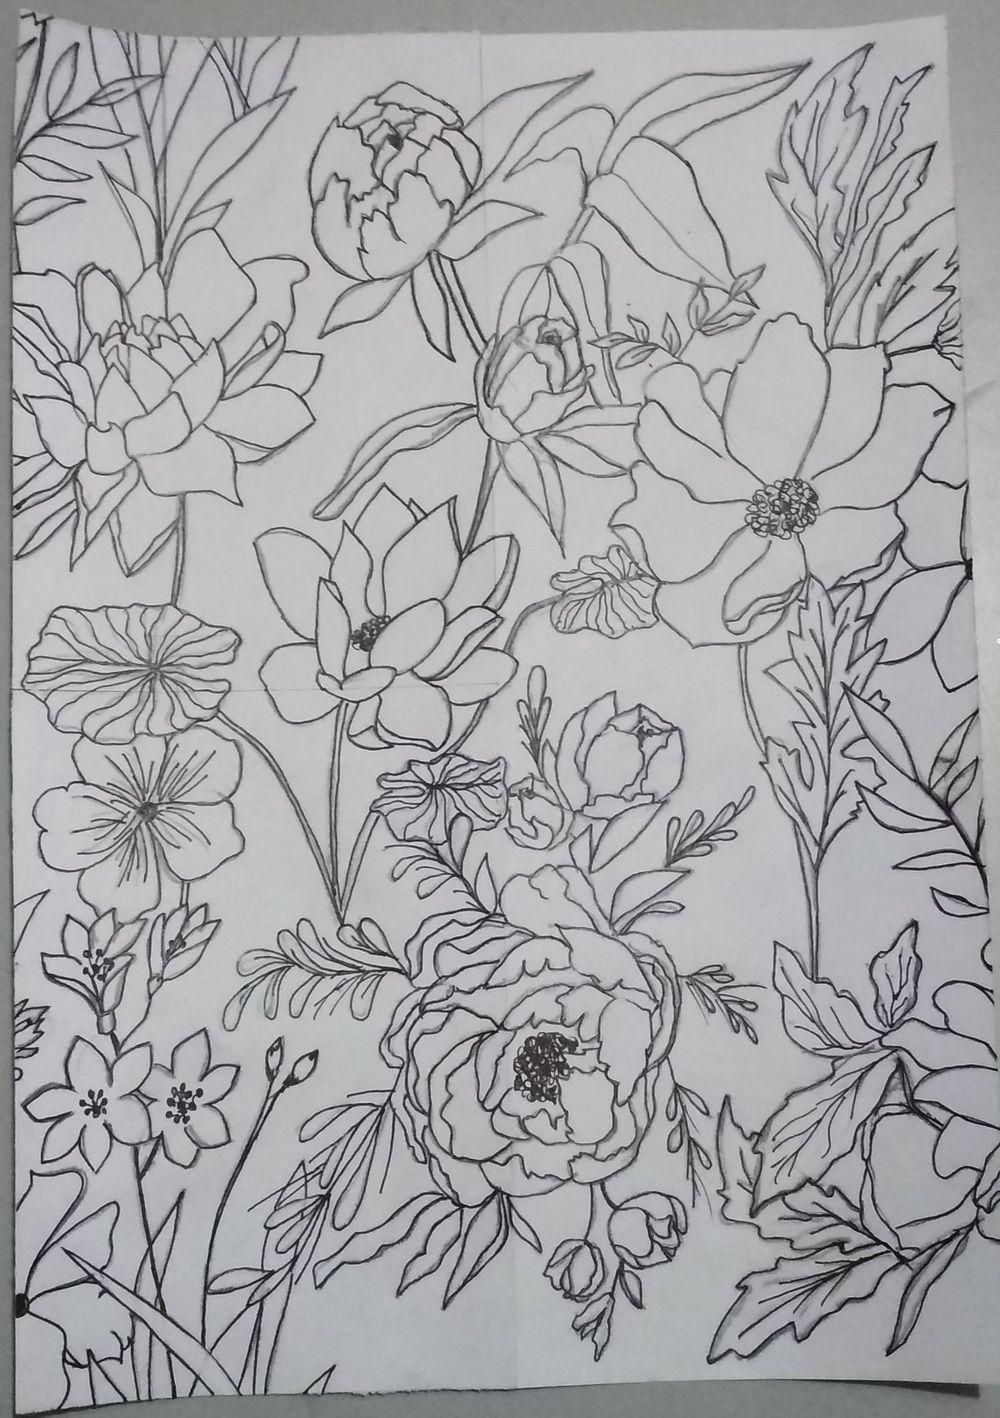 Vintage Florals - image 2 - student project